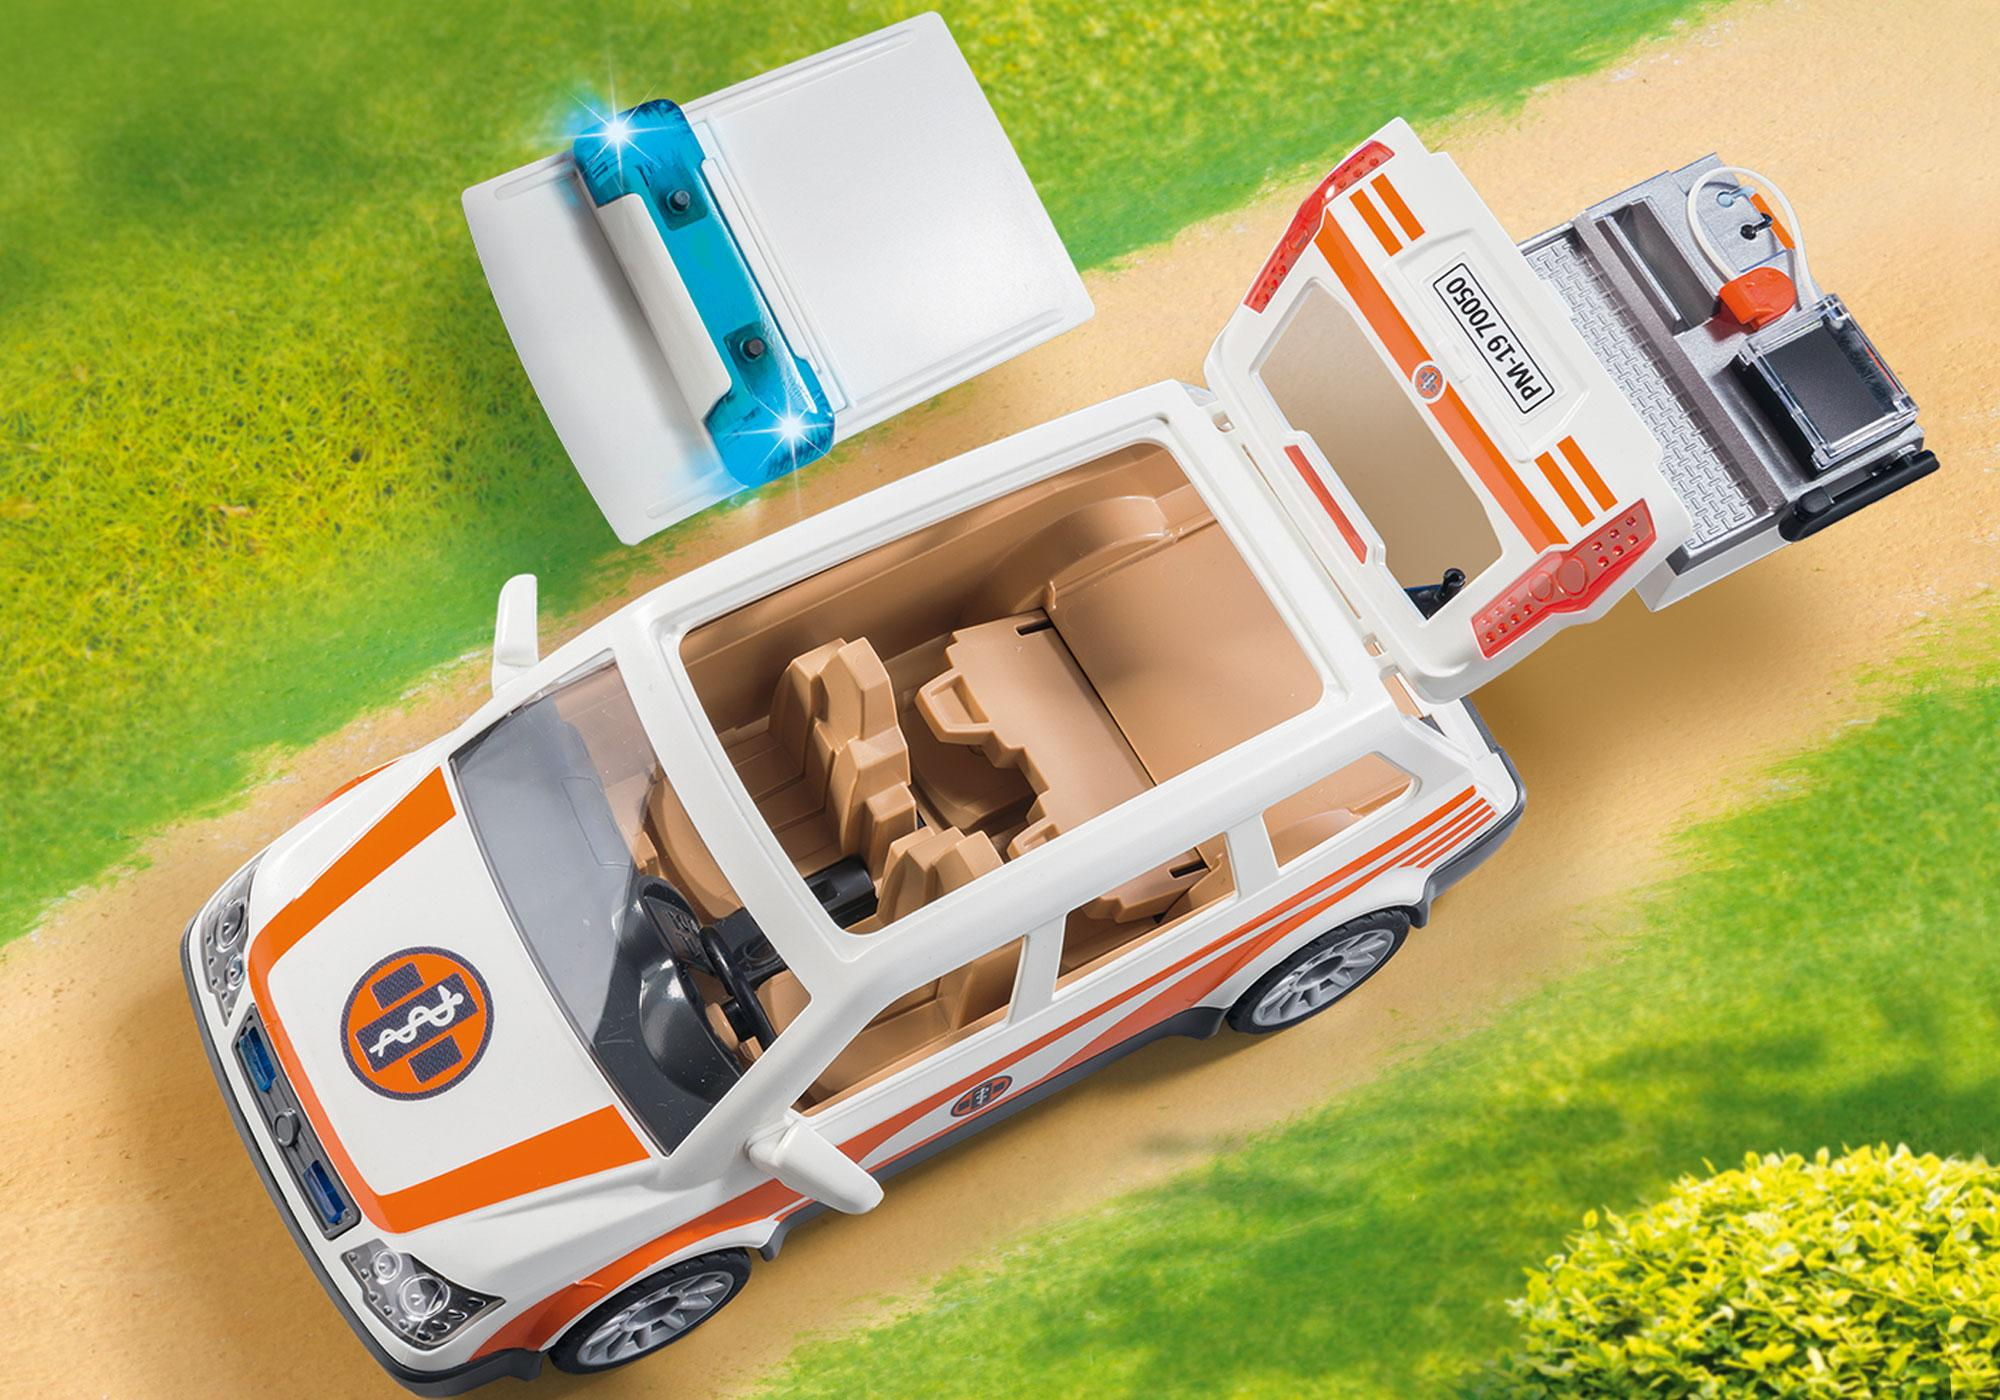 http://media.playmobil.com/i/playmobil/70050_product_extra2/Automedica con sirena